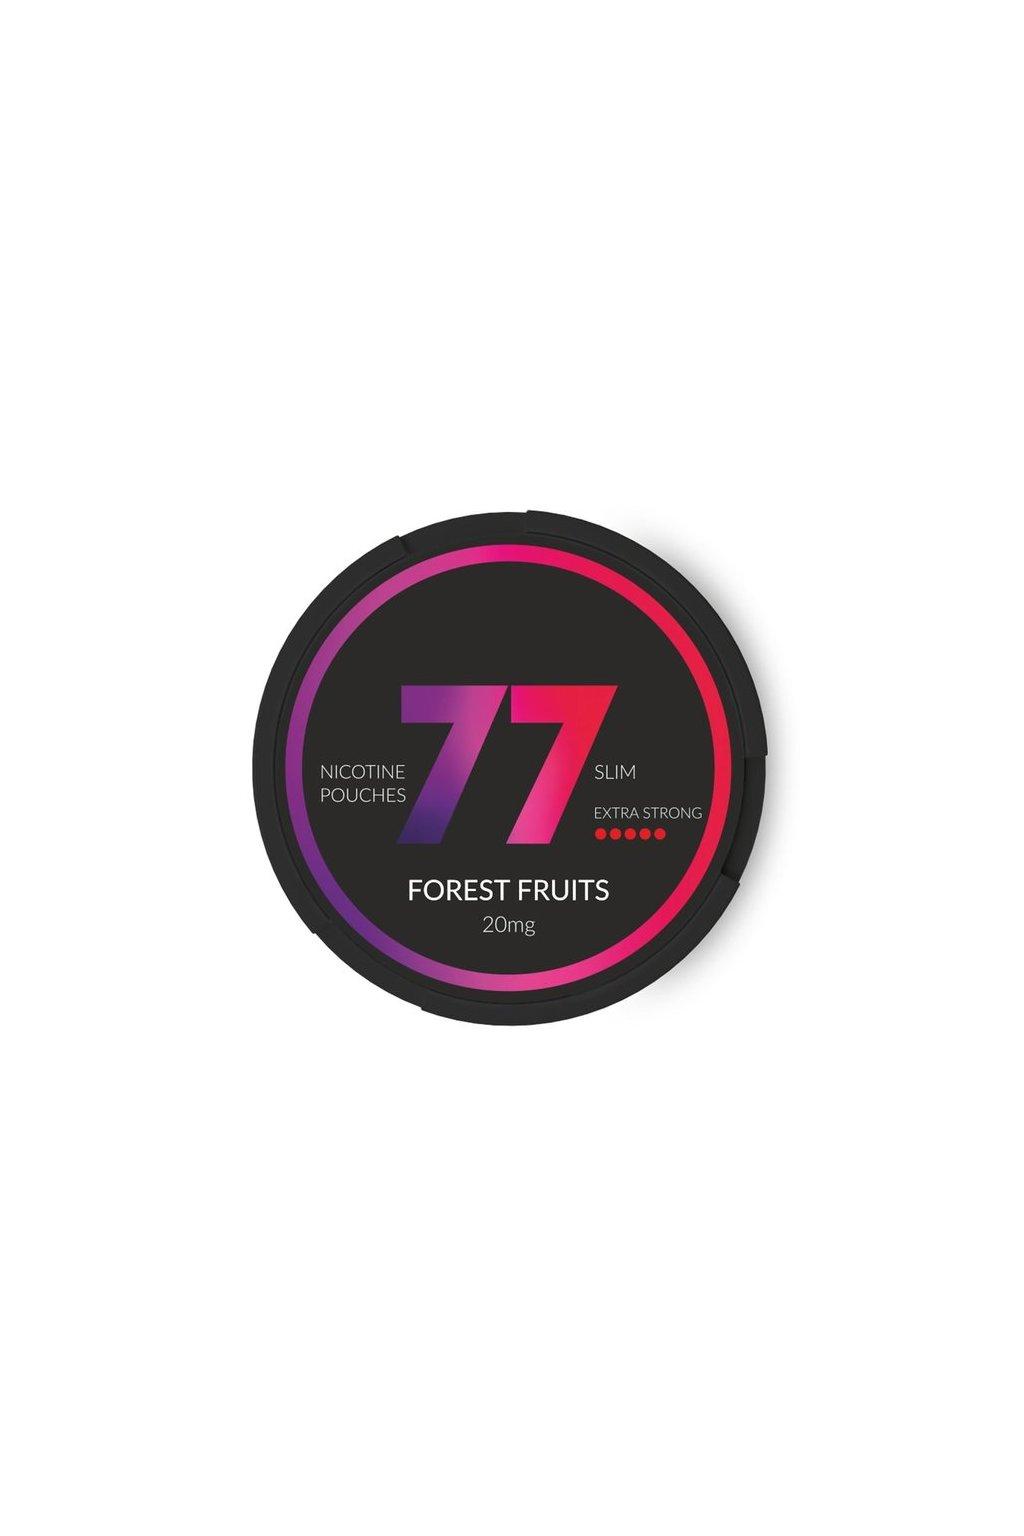 77 forest fruits nikotinove sacky nicopods